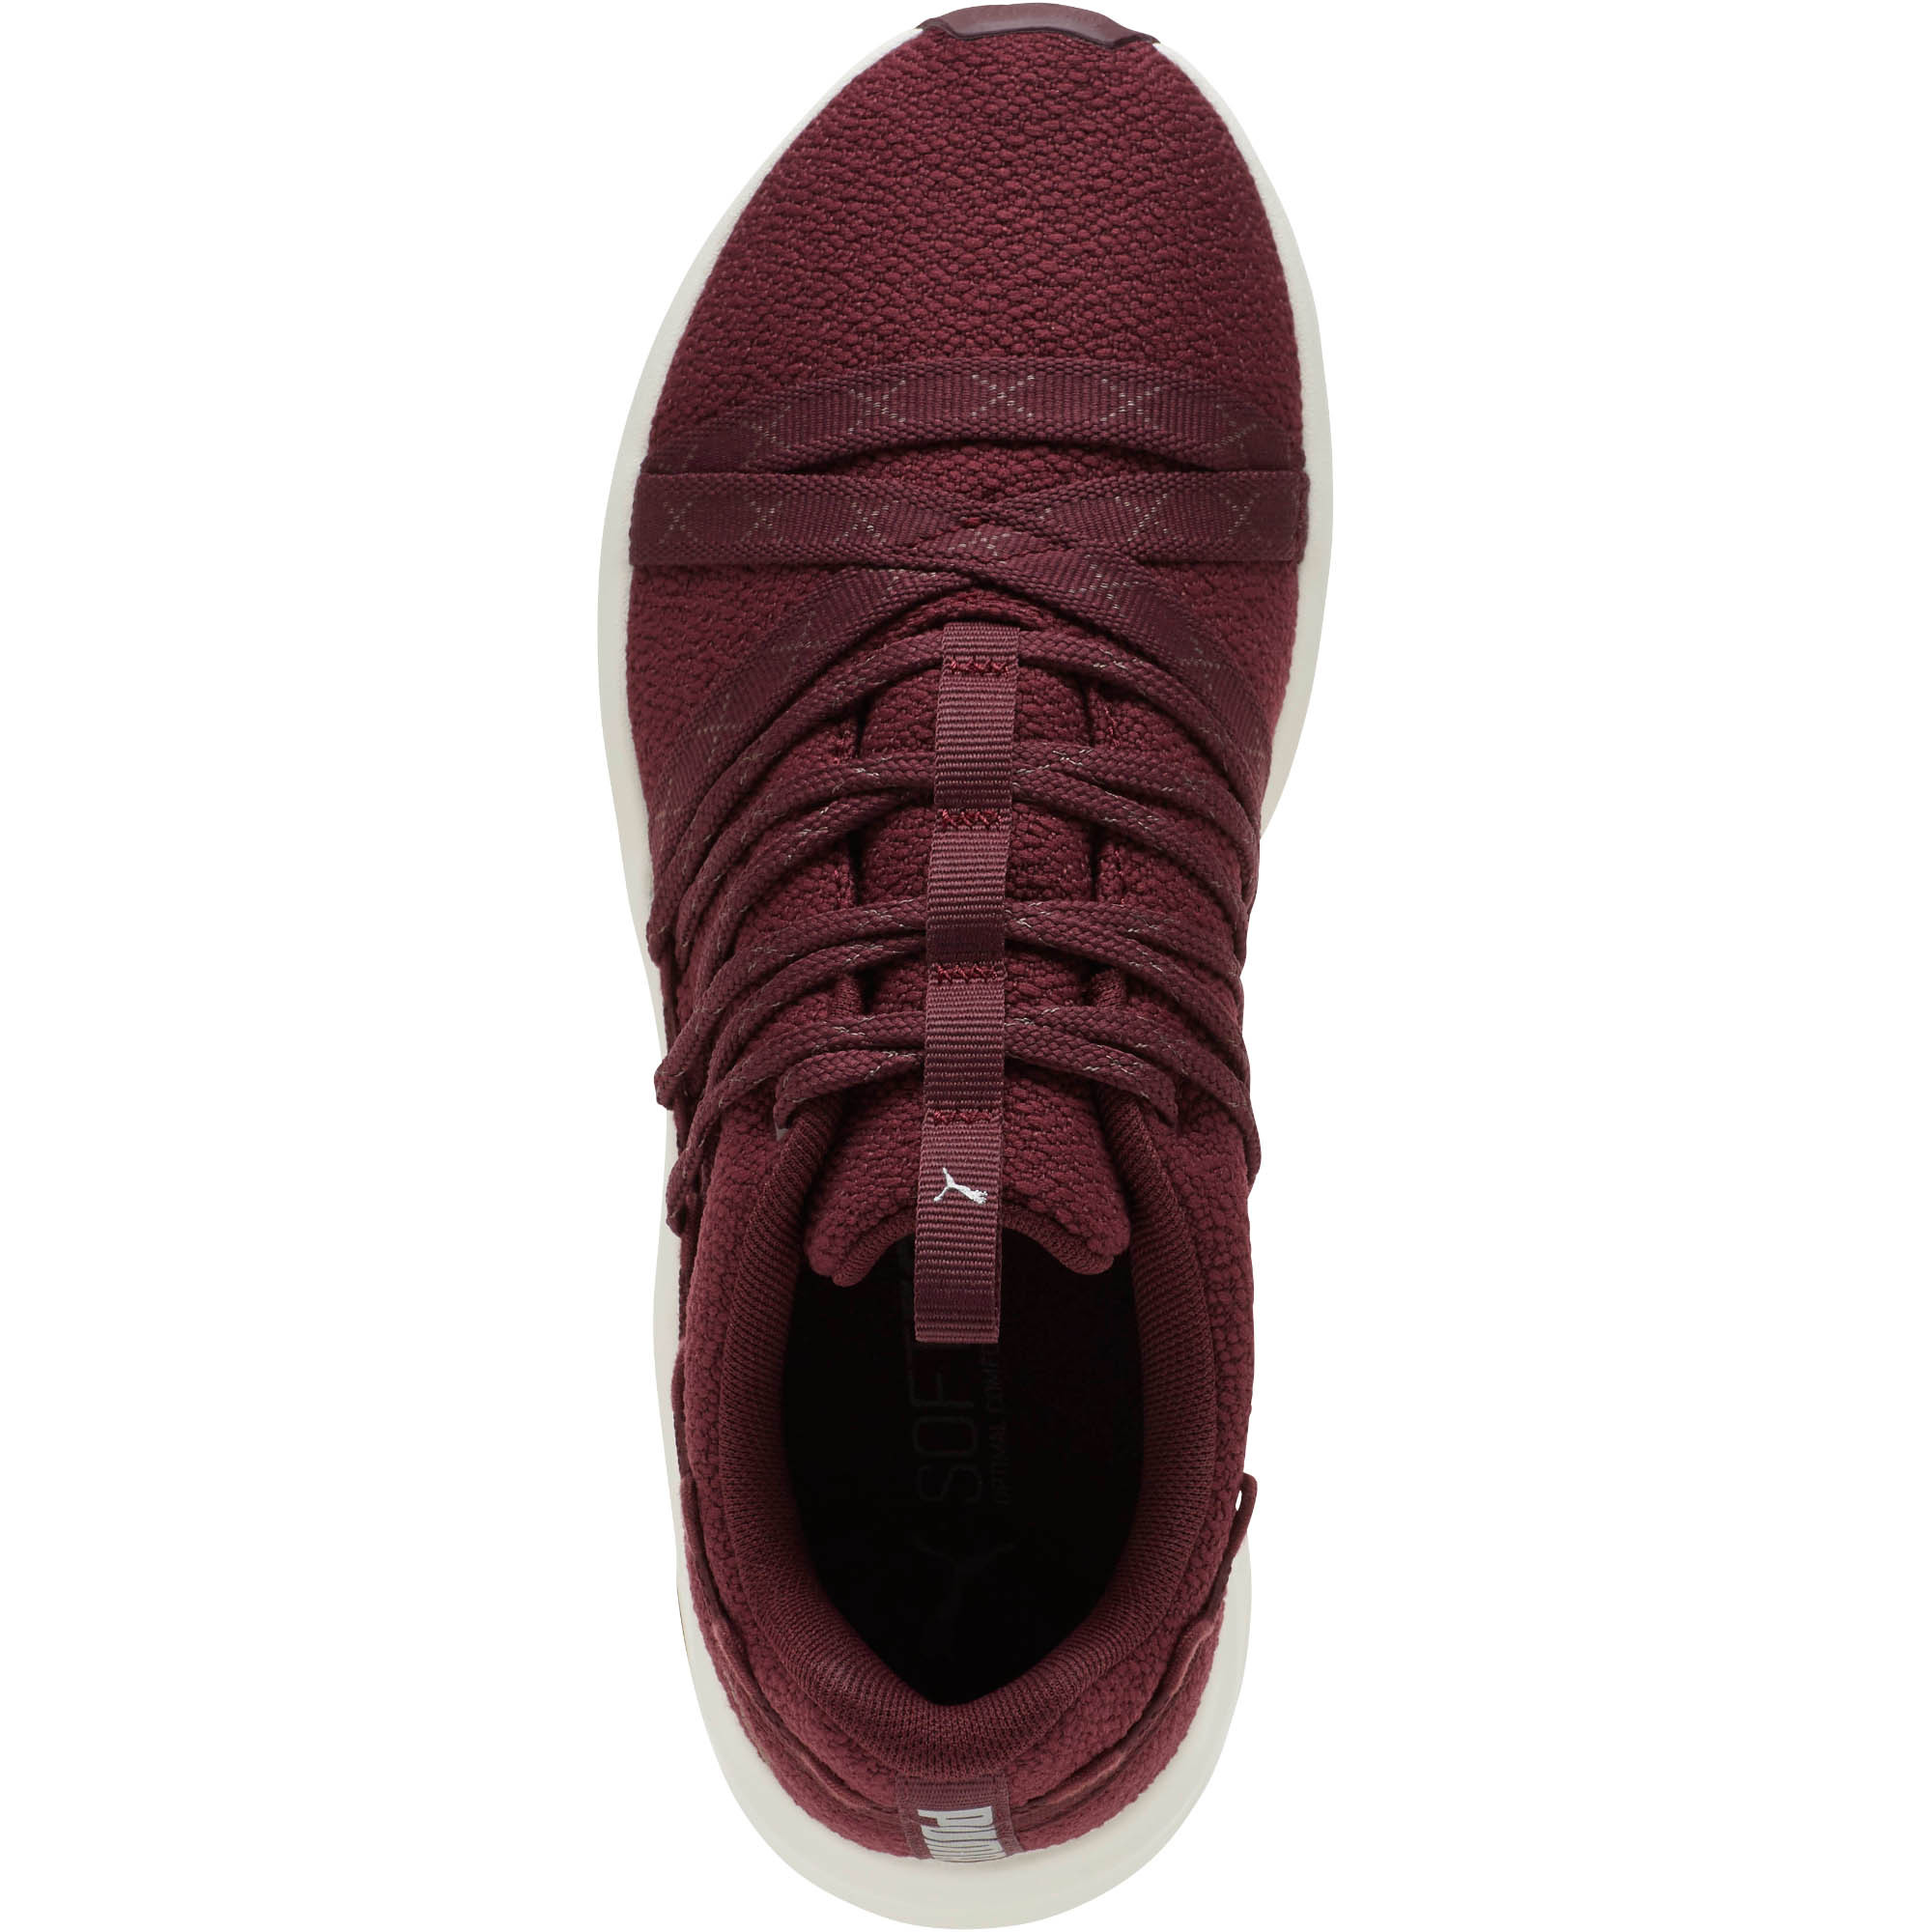 PUMA-Prowl-Alt-2-LX-Women-039-s-Training-Shoes-Women-Shoe-Training thumbnail 6